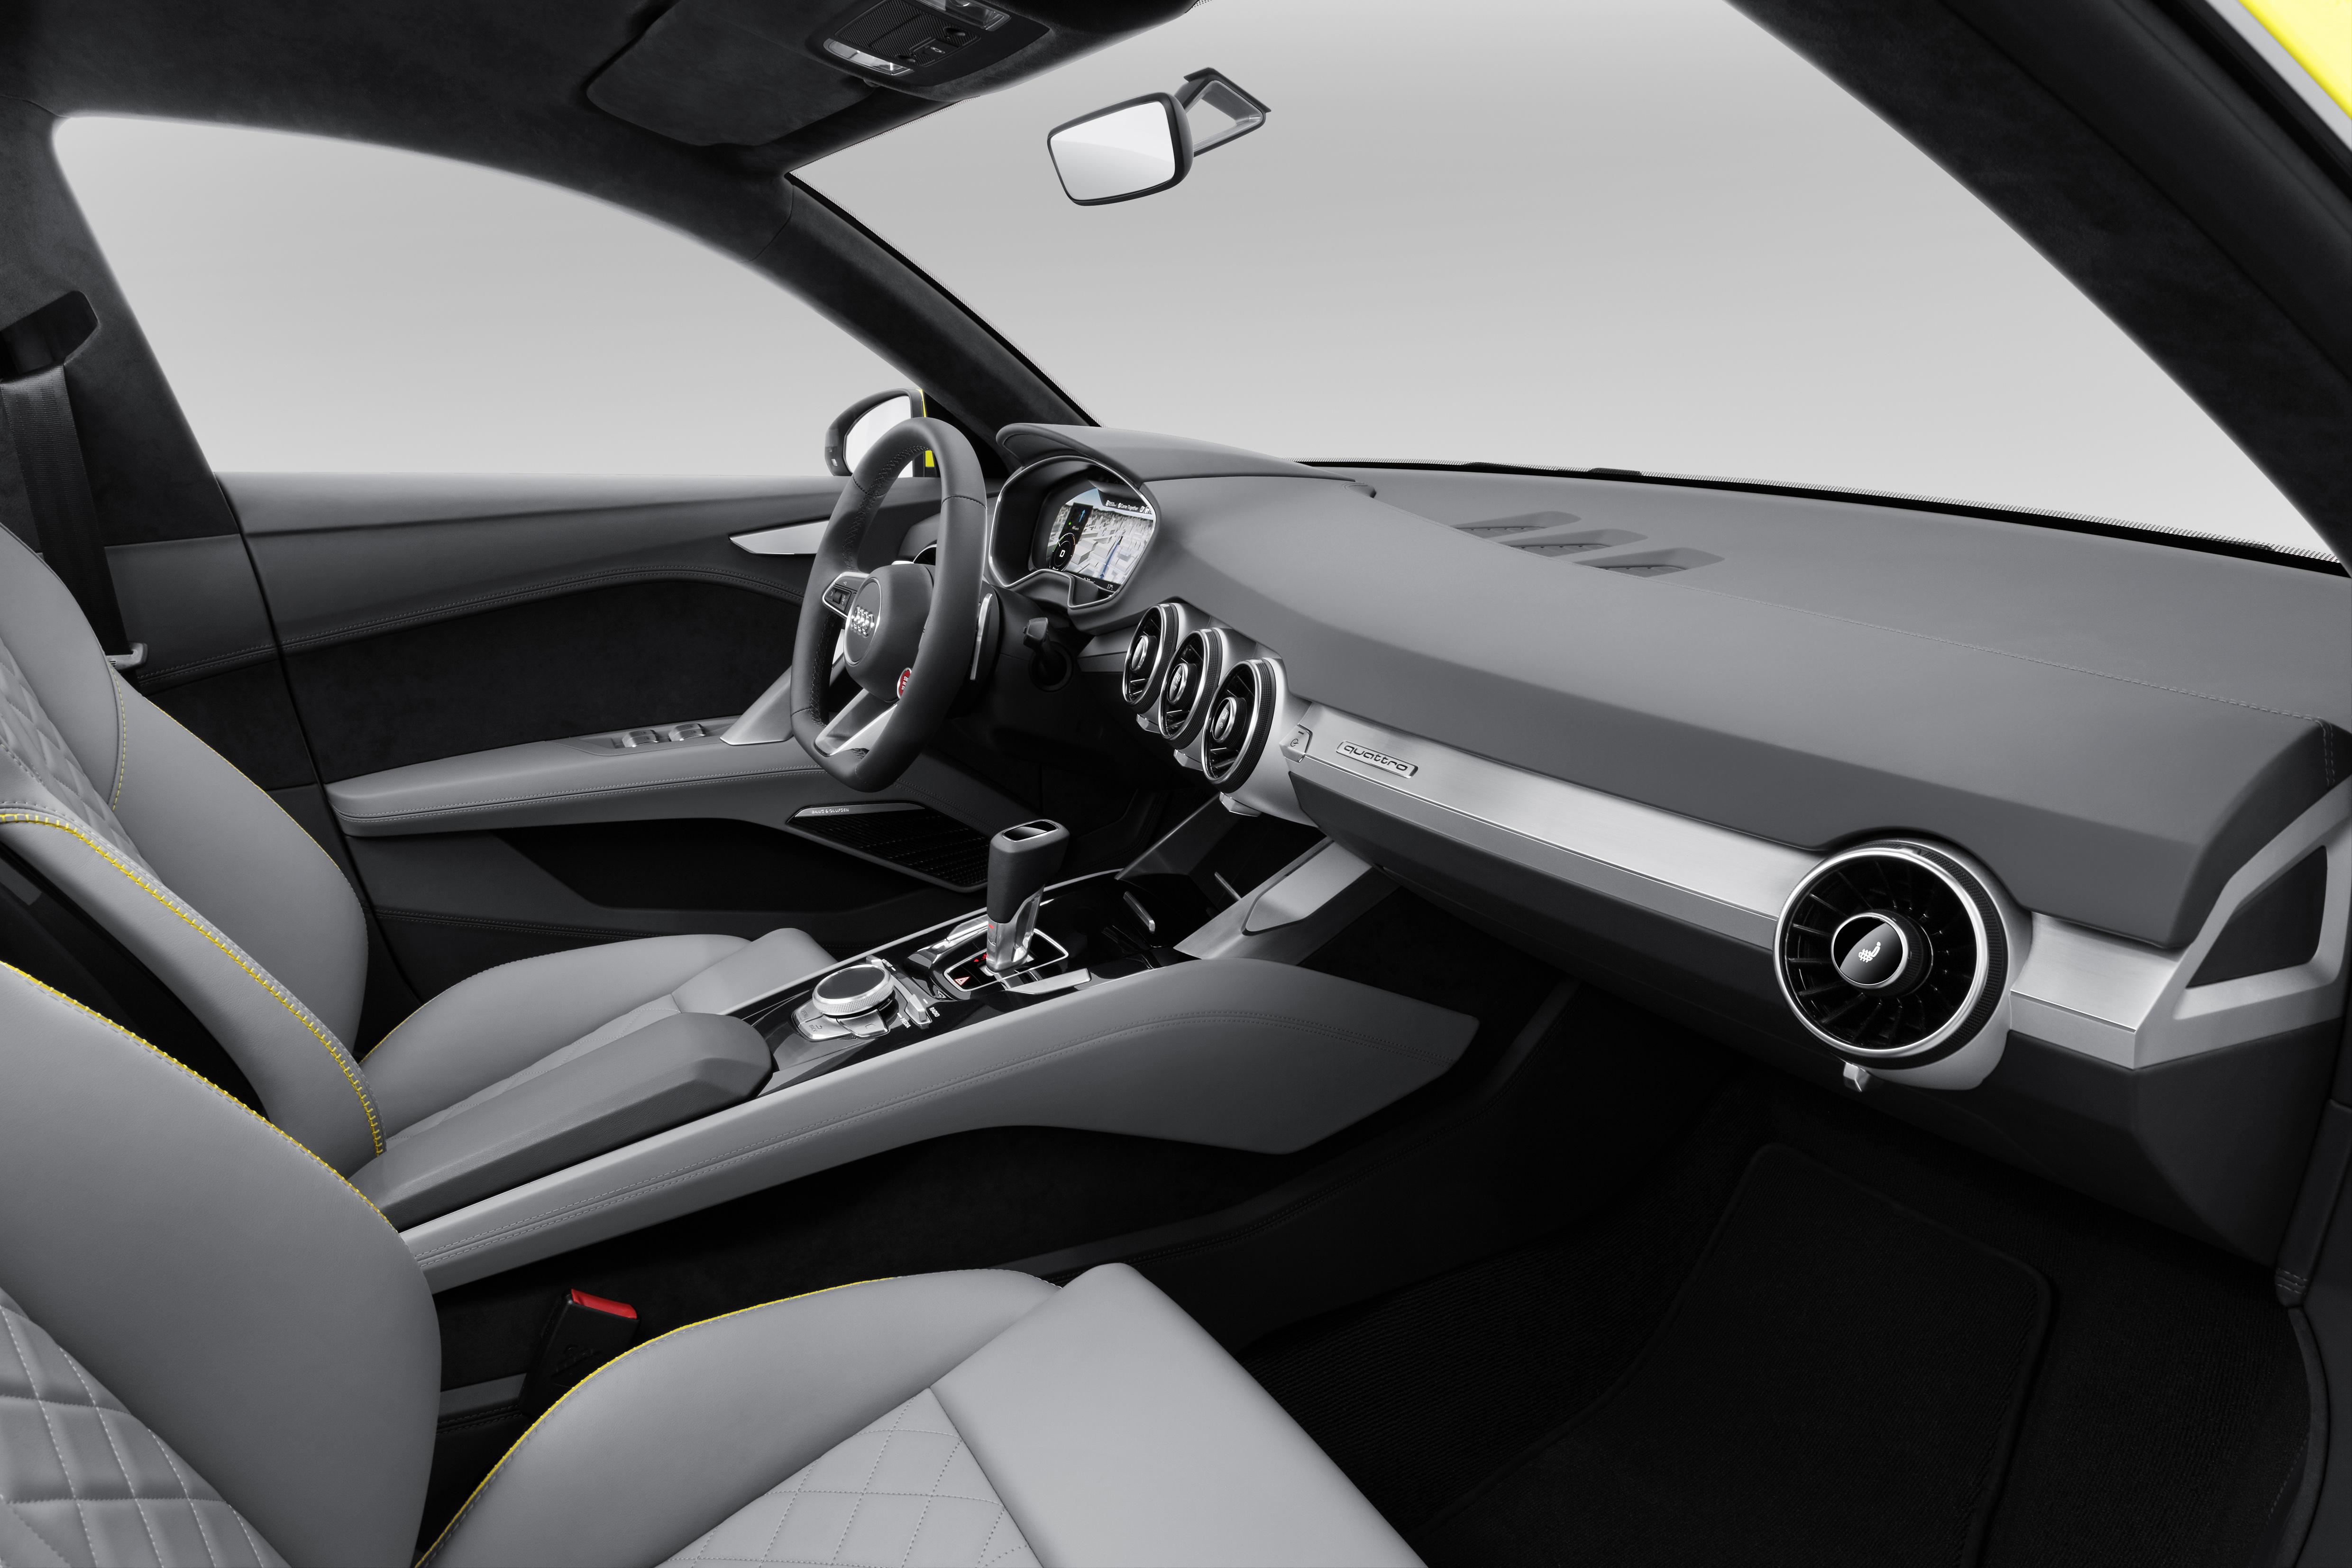 Audi TT Offroad Concept previews future Q4 'TT SUV' Image ...